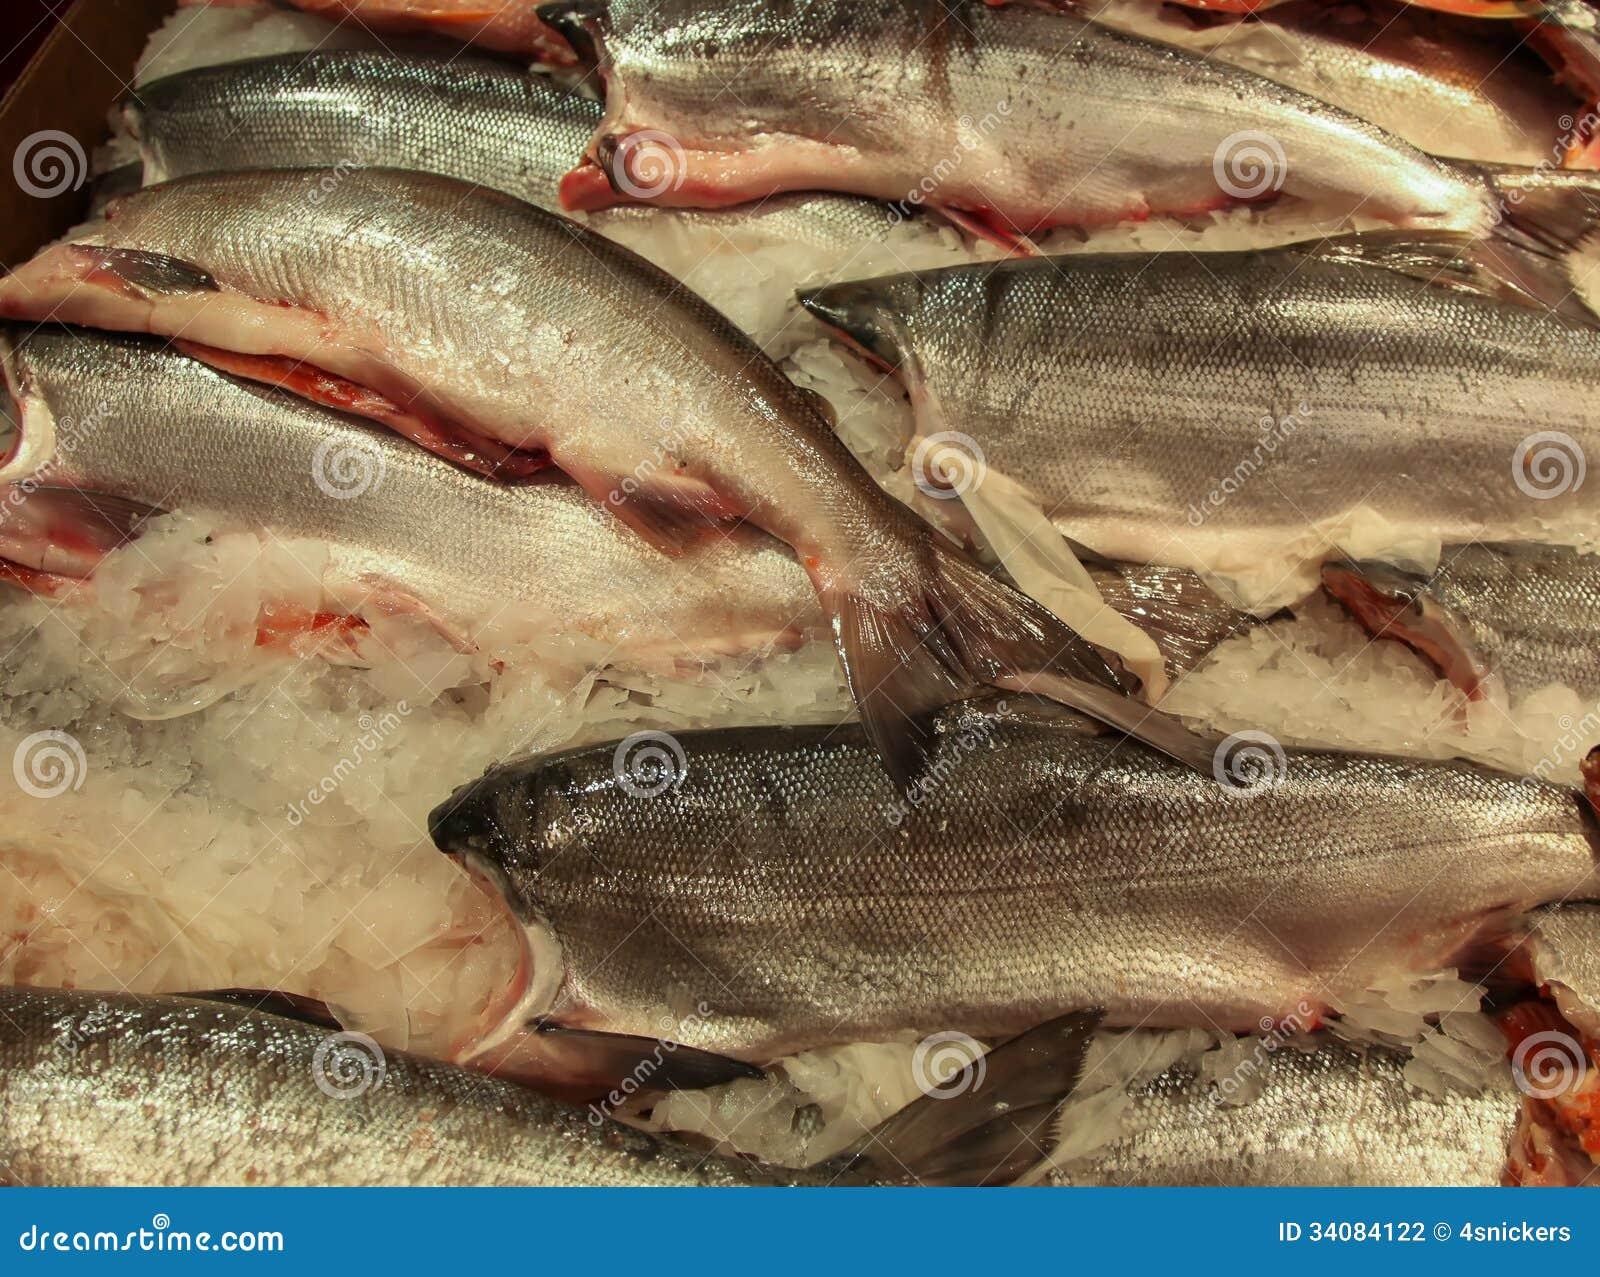 Fish market king salmon stock photography image 34084122 for King fish market